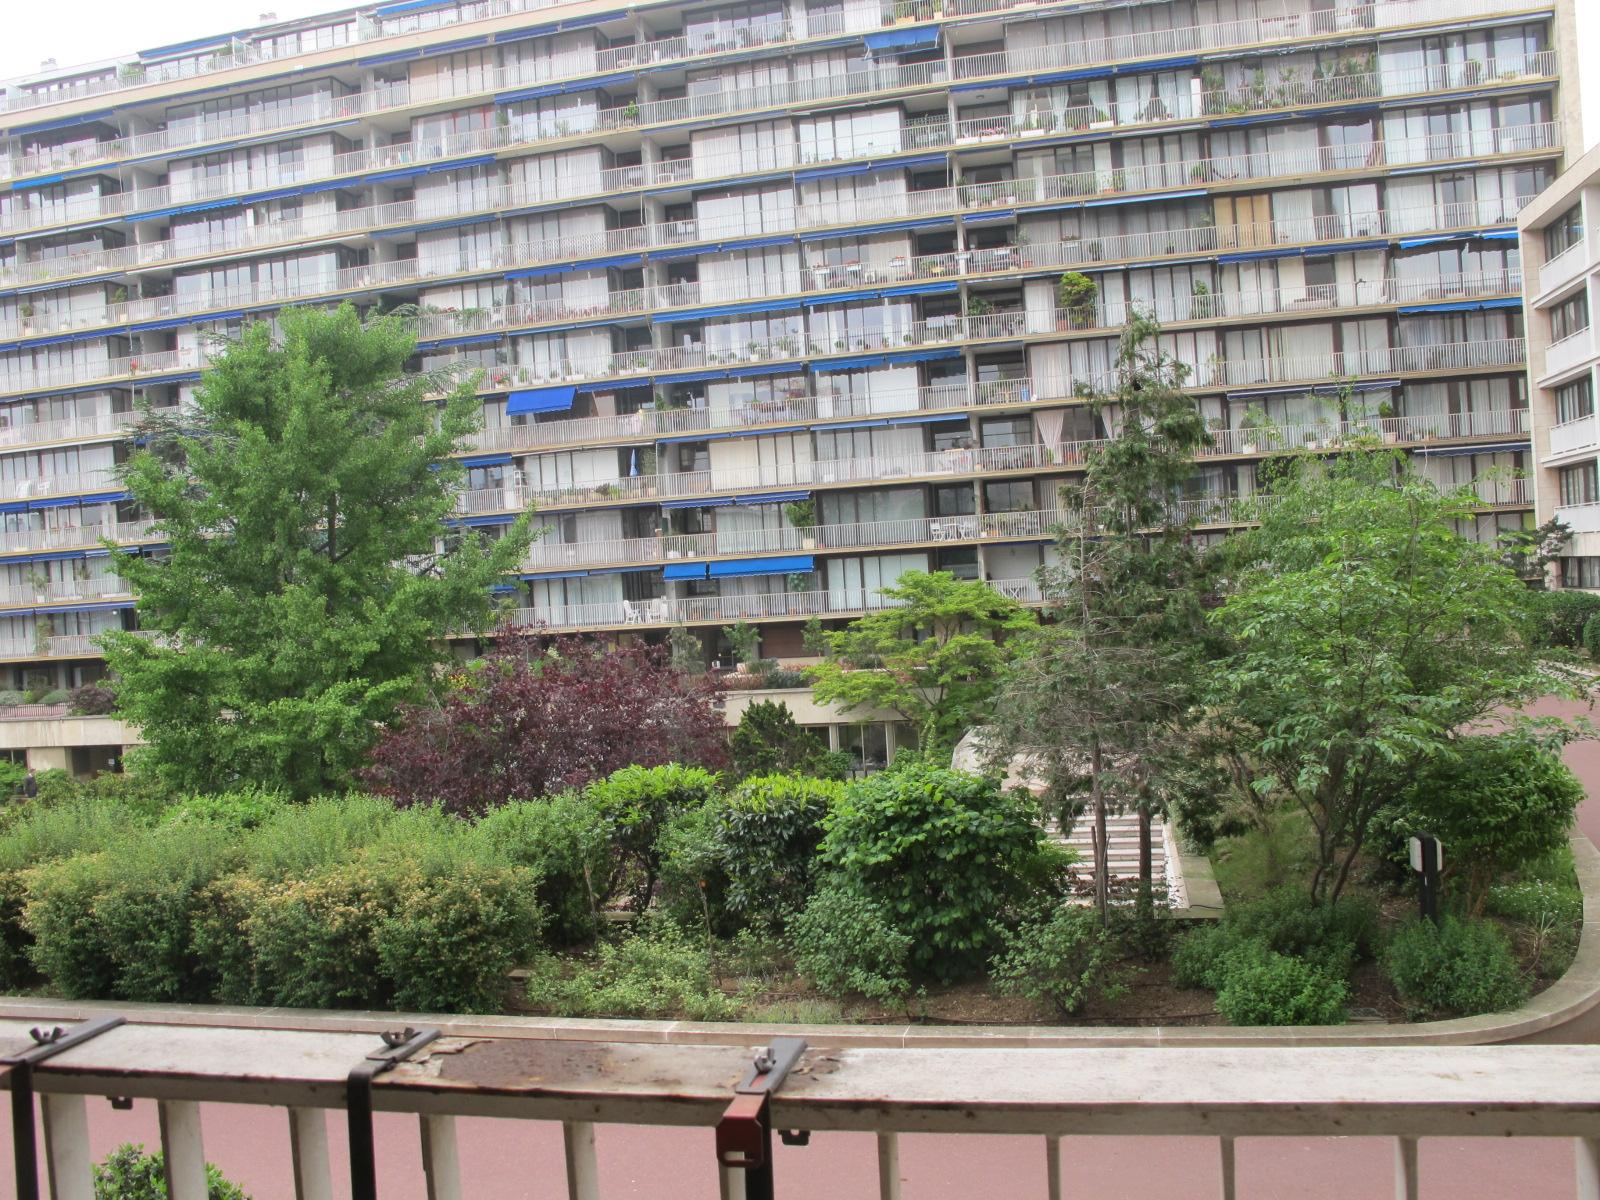 Location immobilier professionnel m tro marcel sembat - Metro marcel sembat boulogne ...